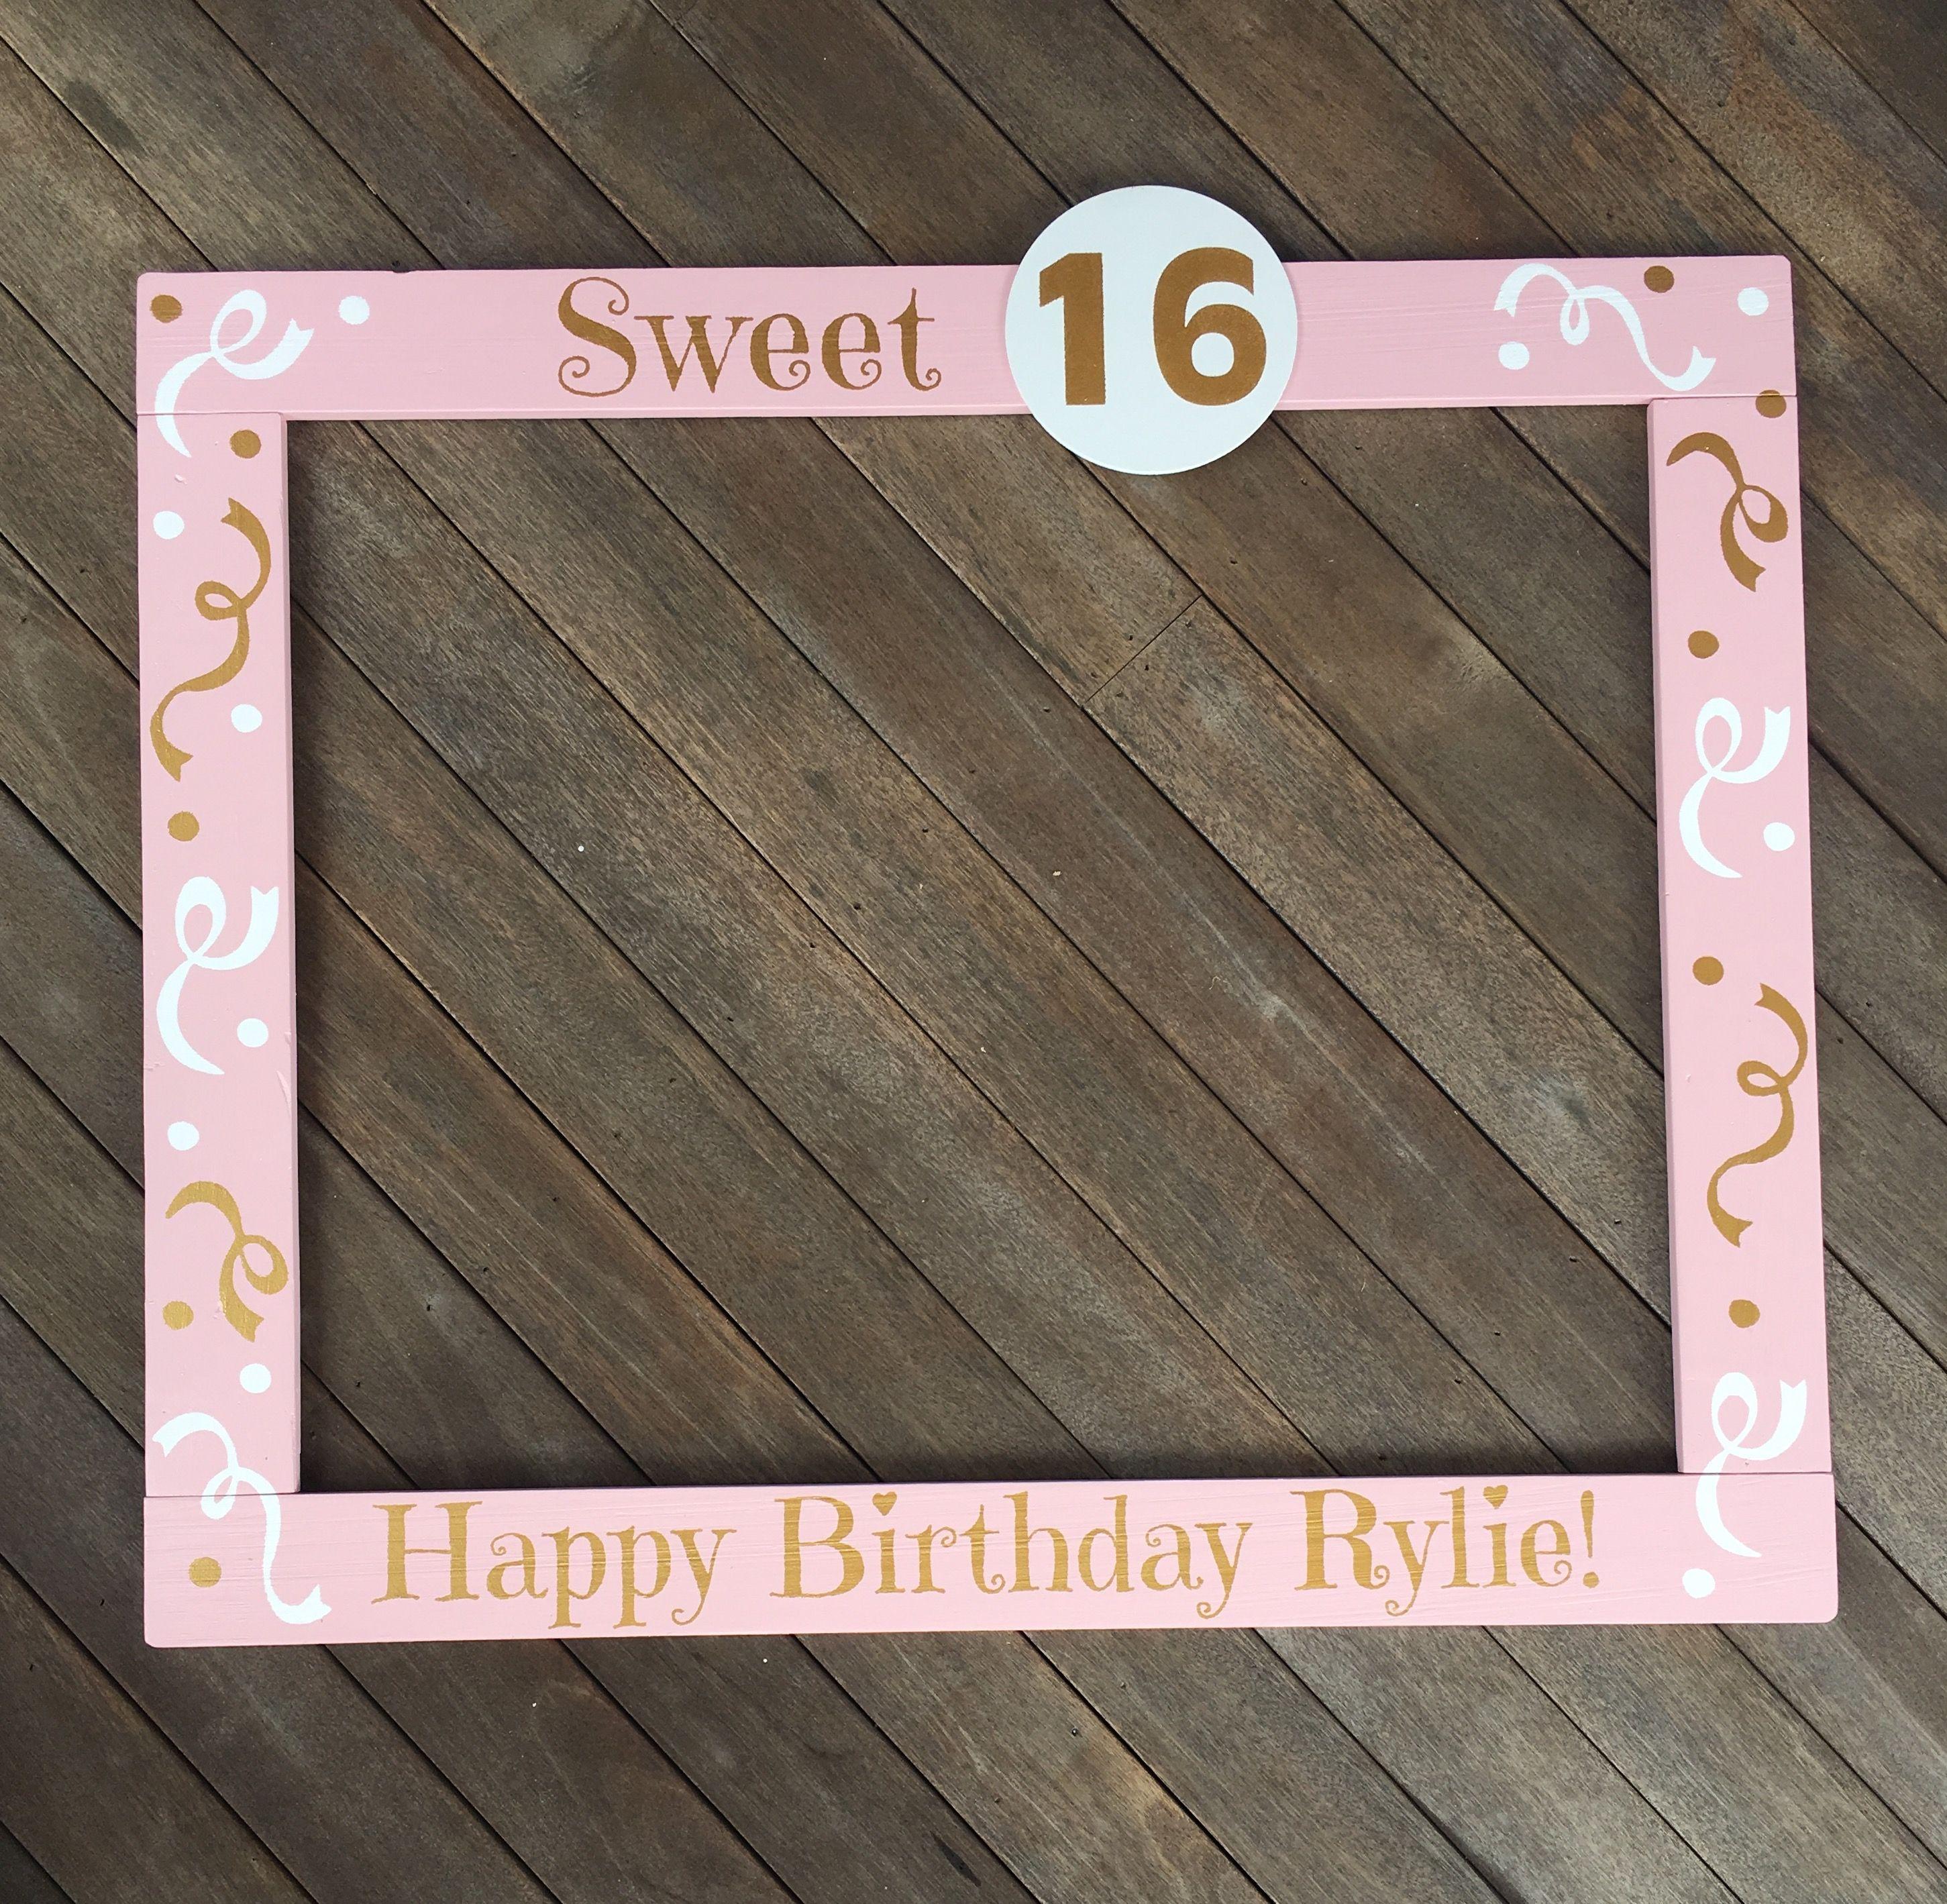 Sweet 16 Birthday Photobooth Frame